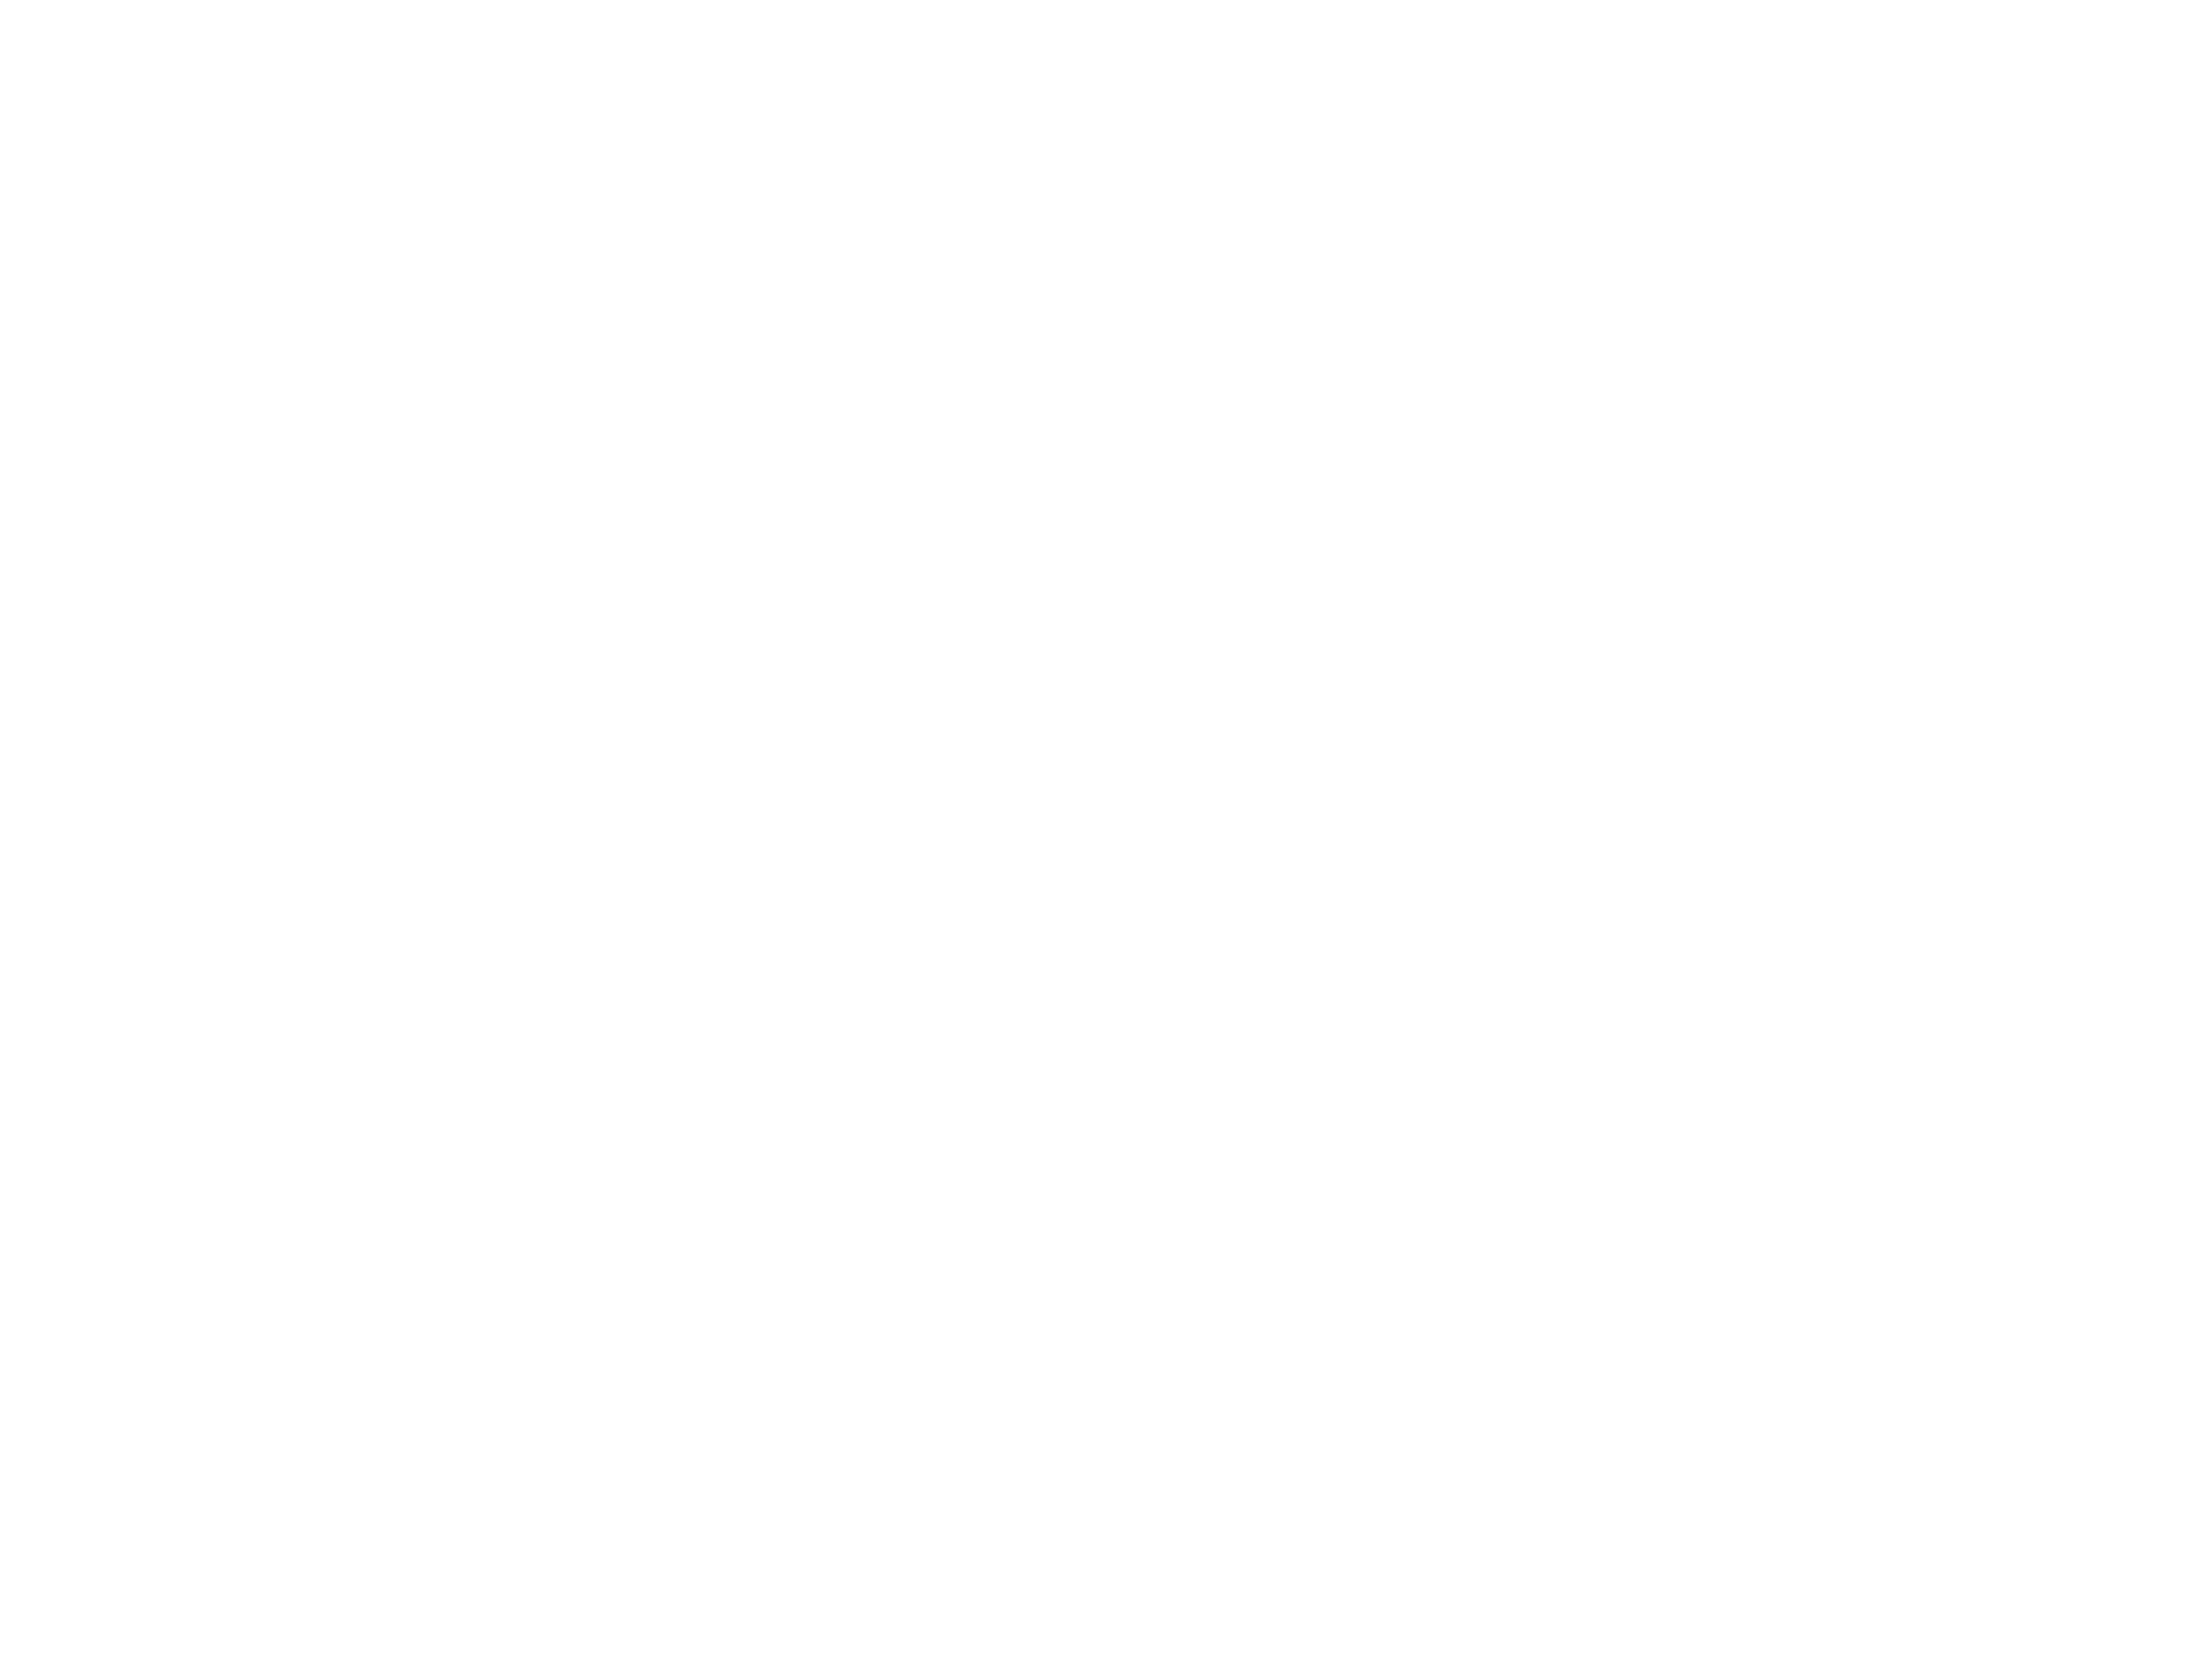 img-4711